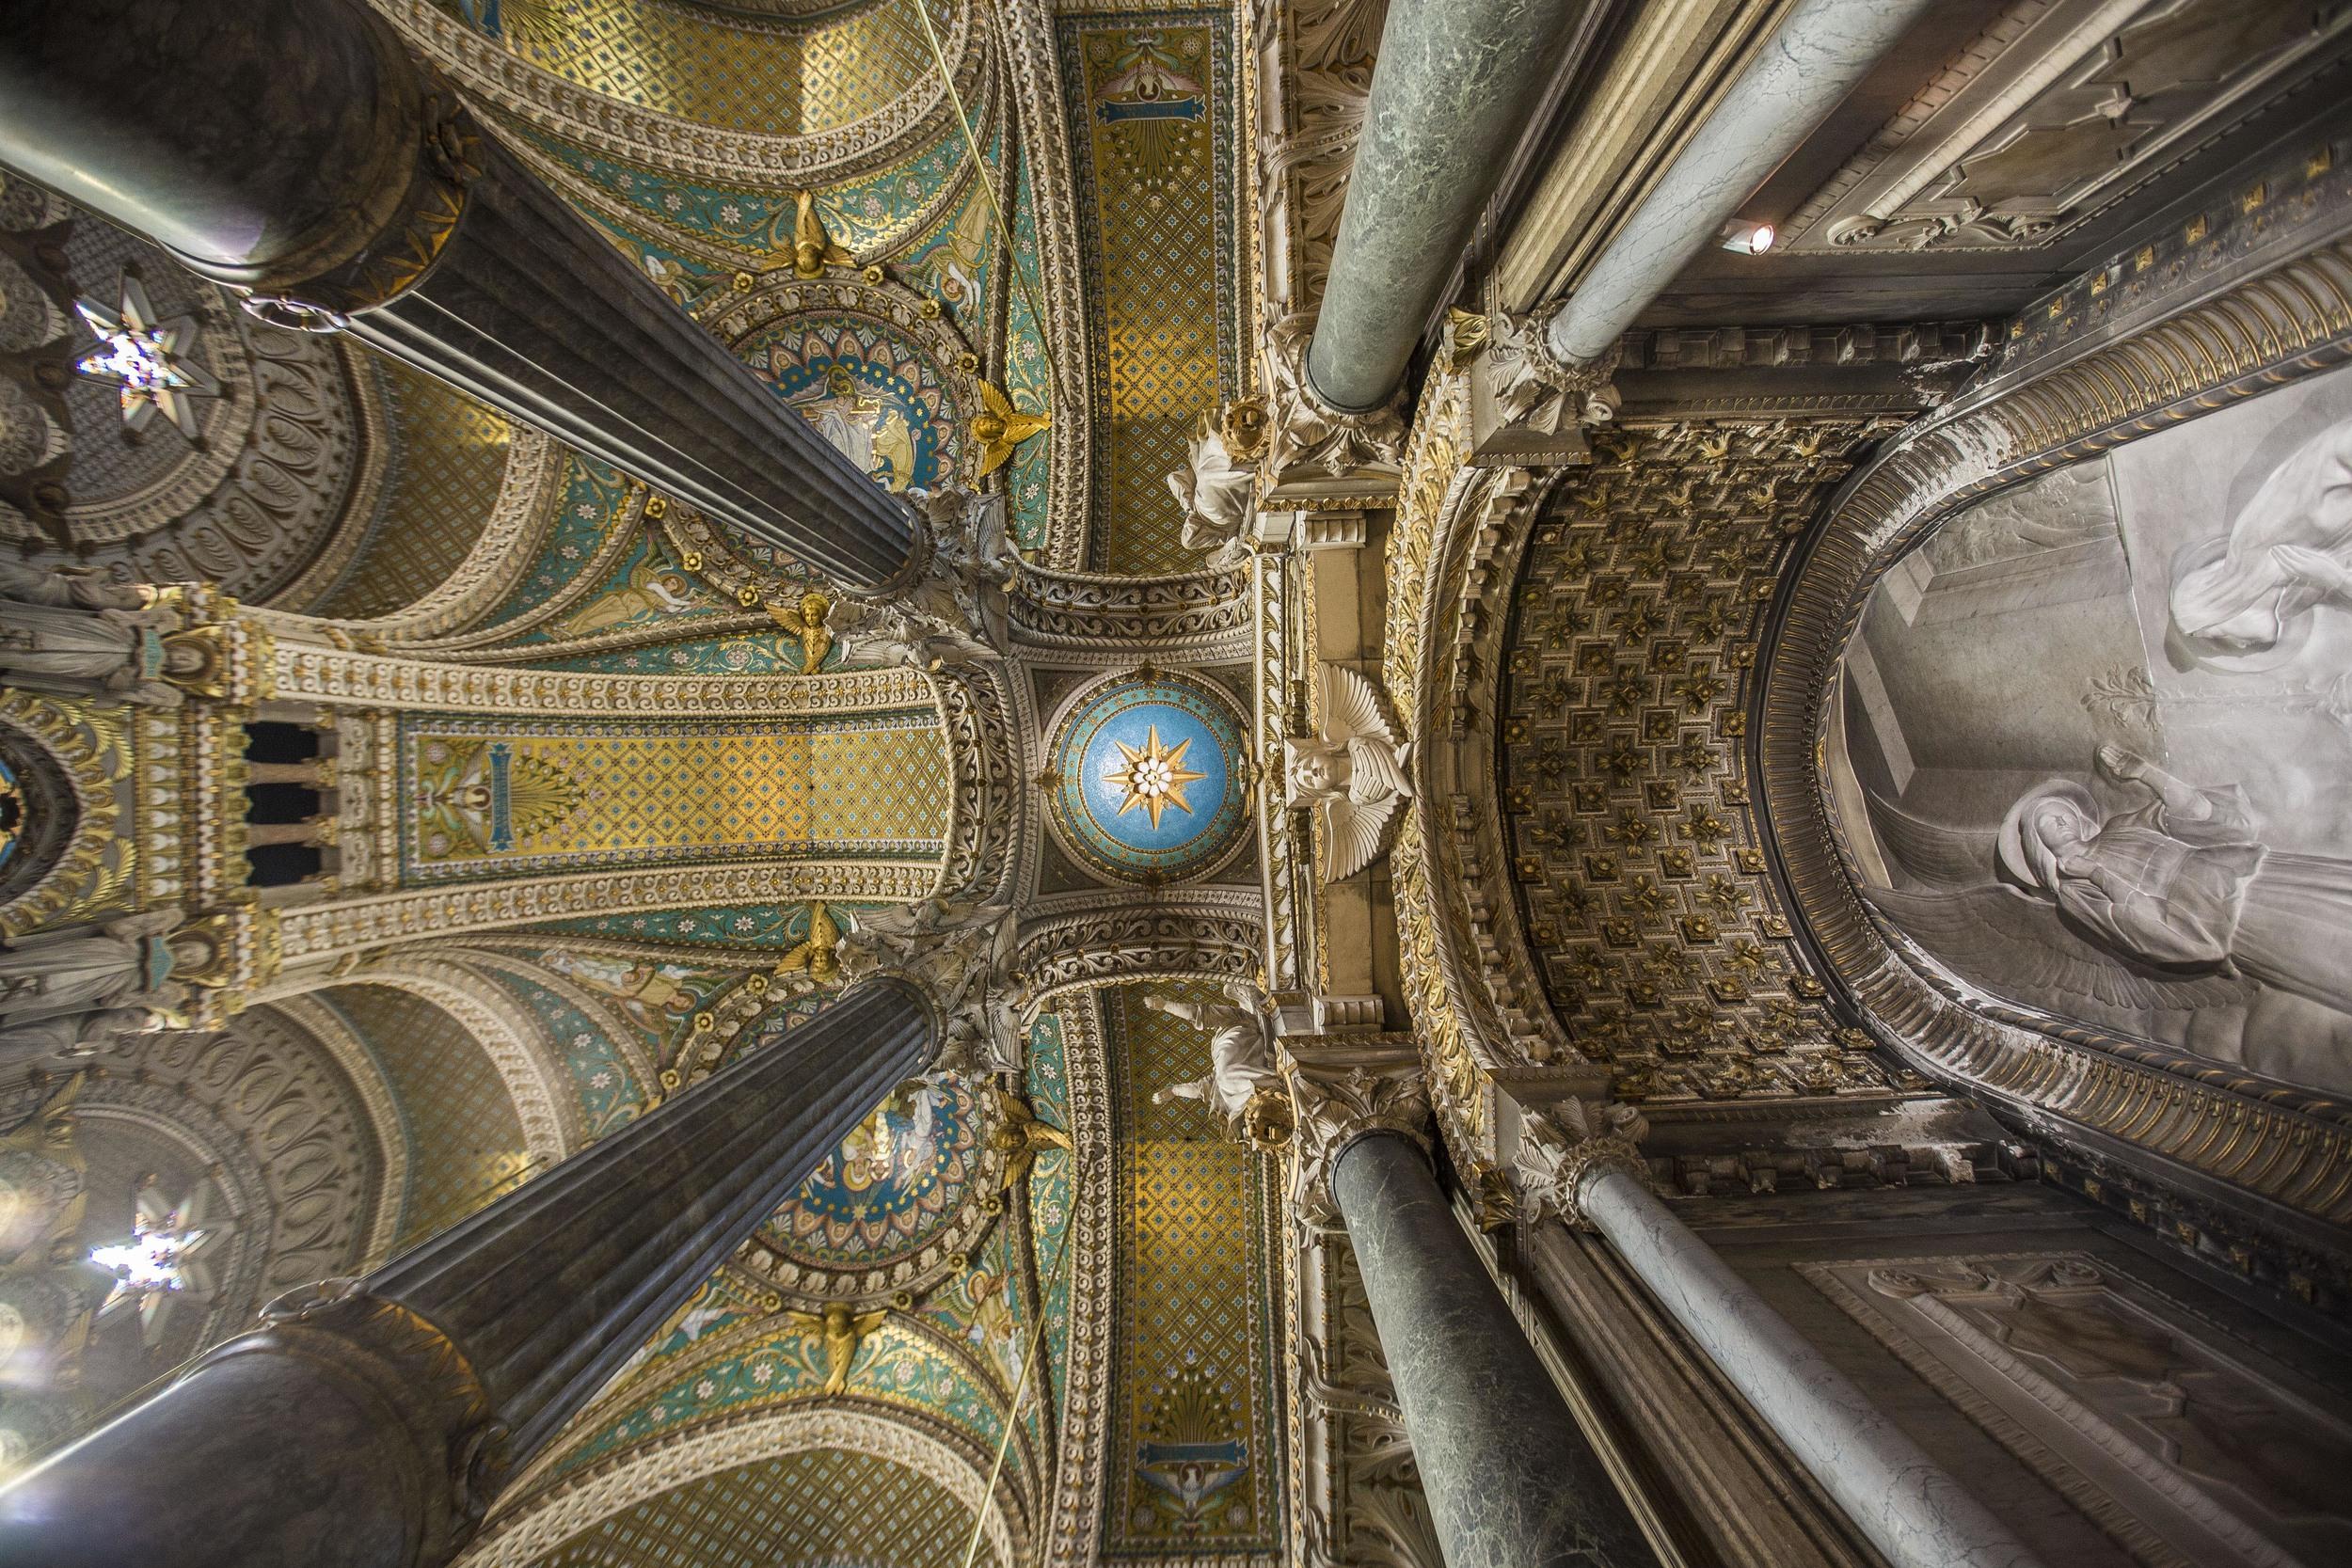 Lyon_France_229.jpg